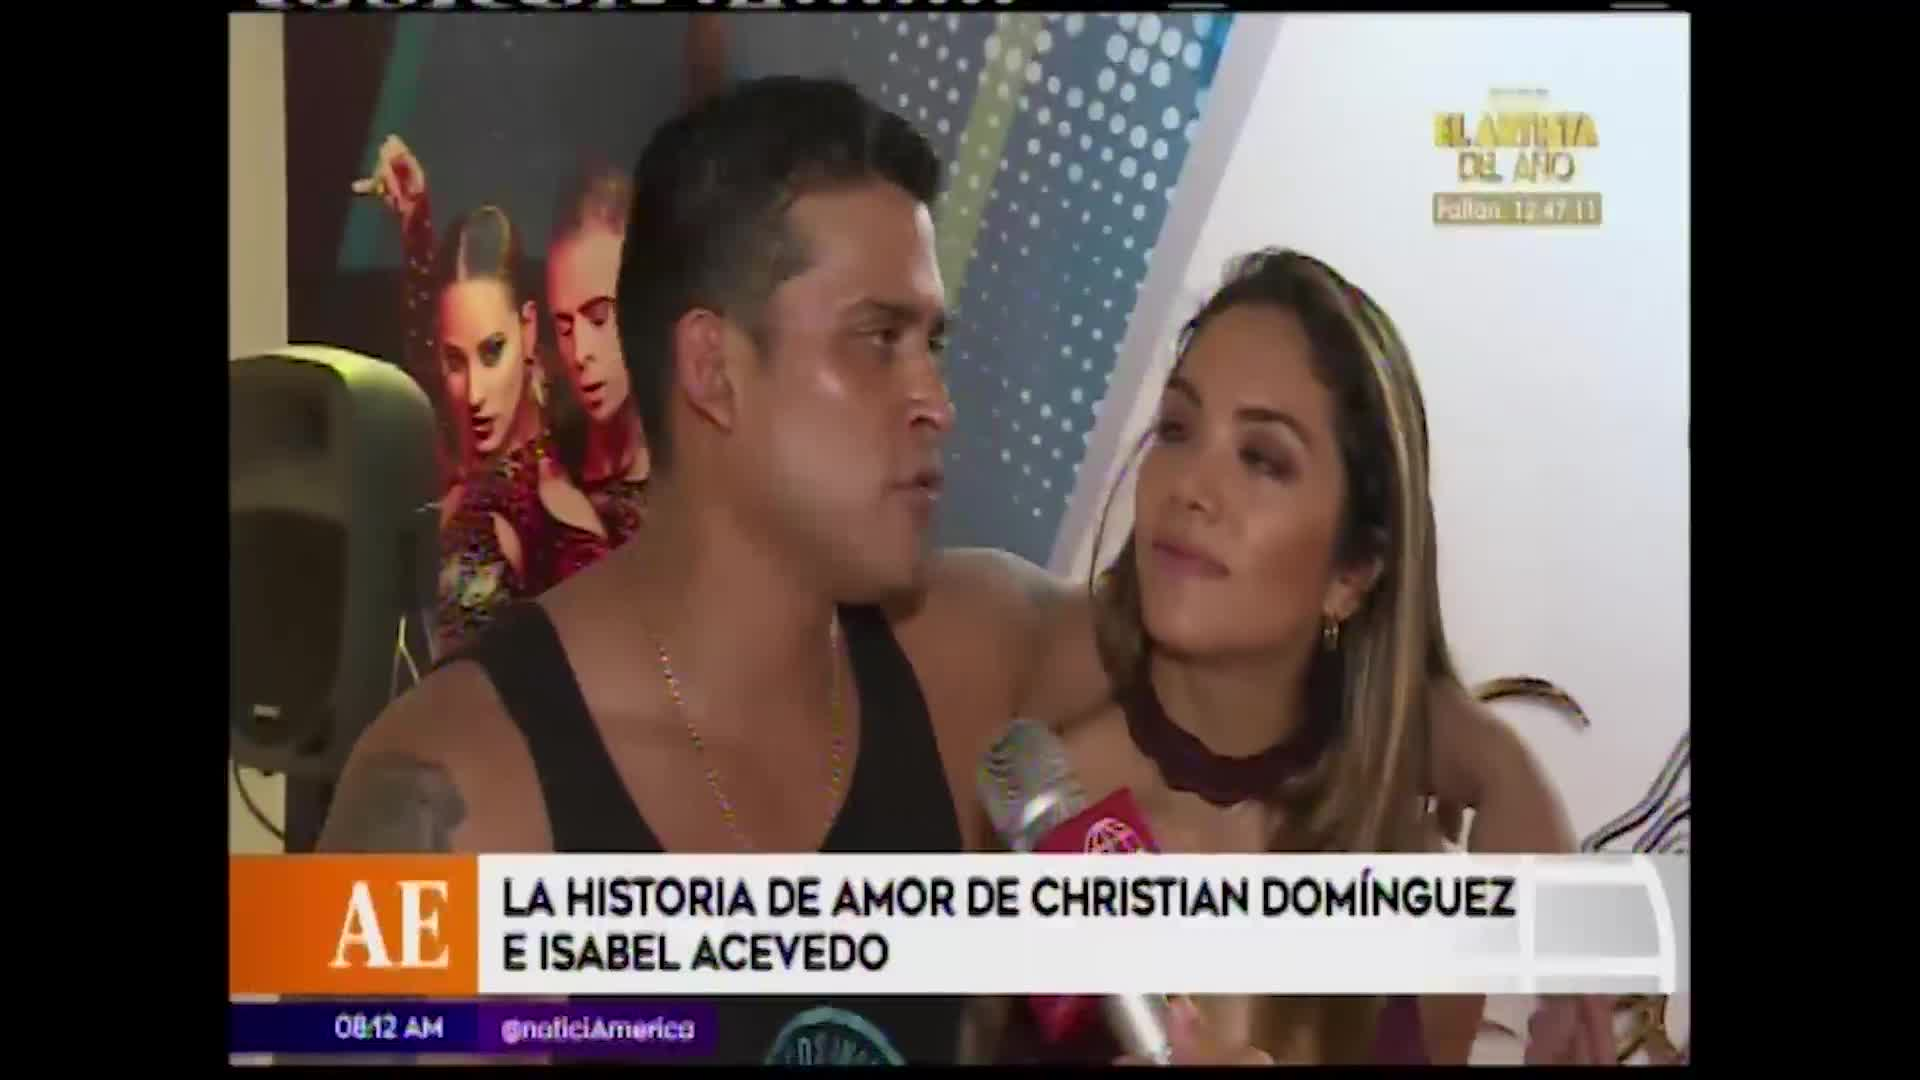 Christian Domínguez e Isabel Acevedo: la historia del amor que llegó a su fin tras tres años